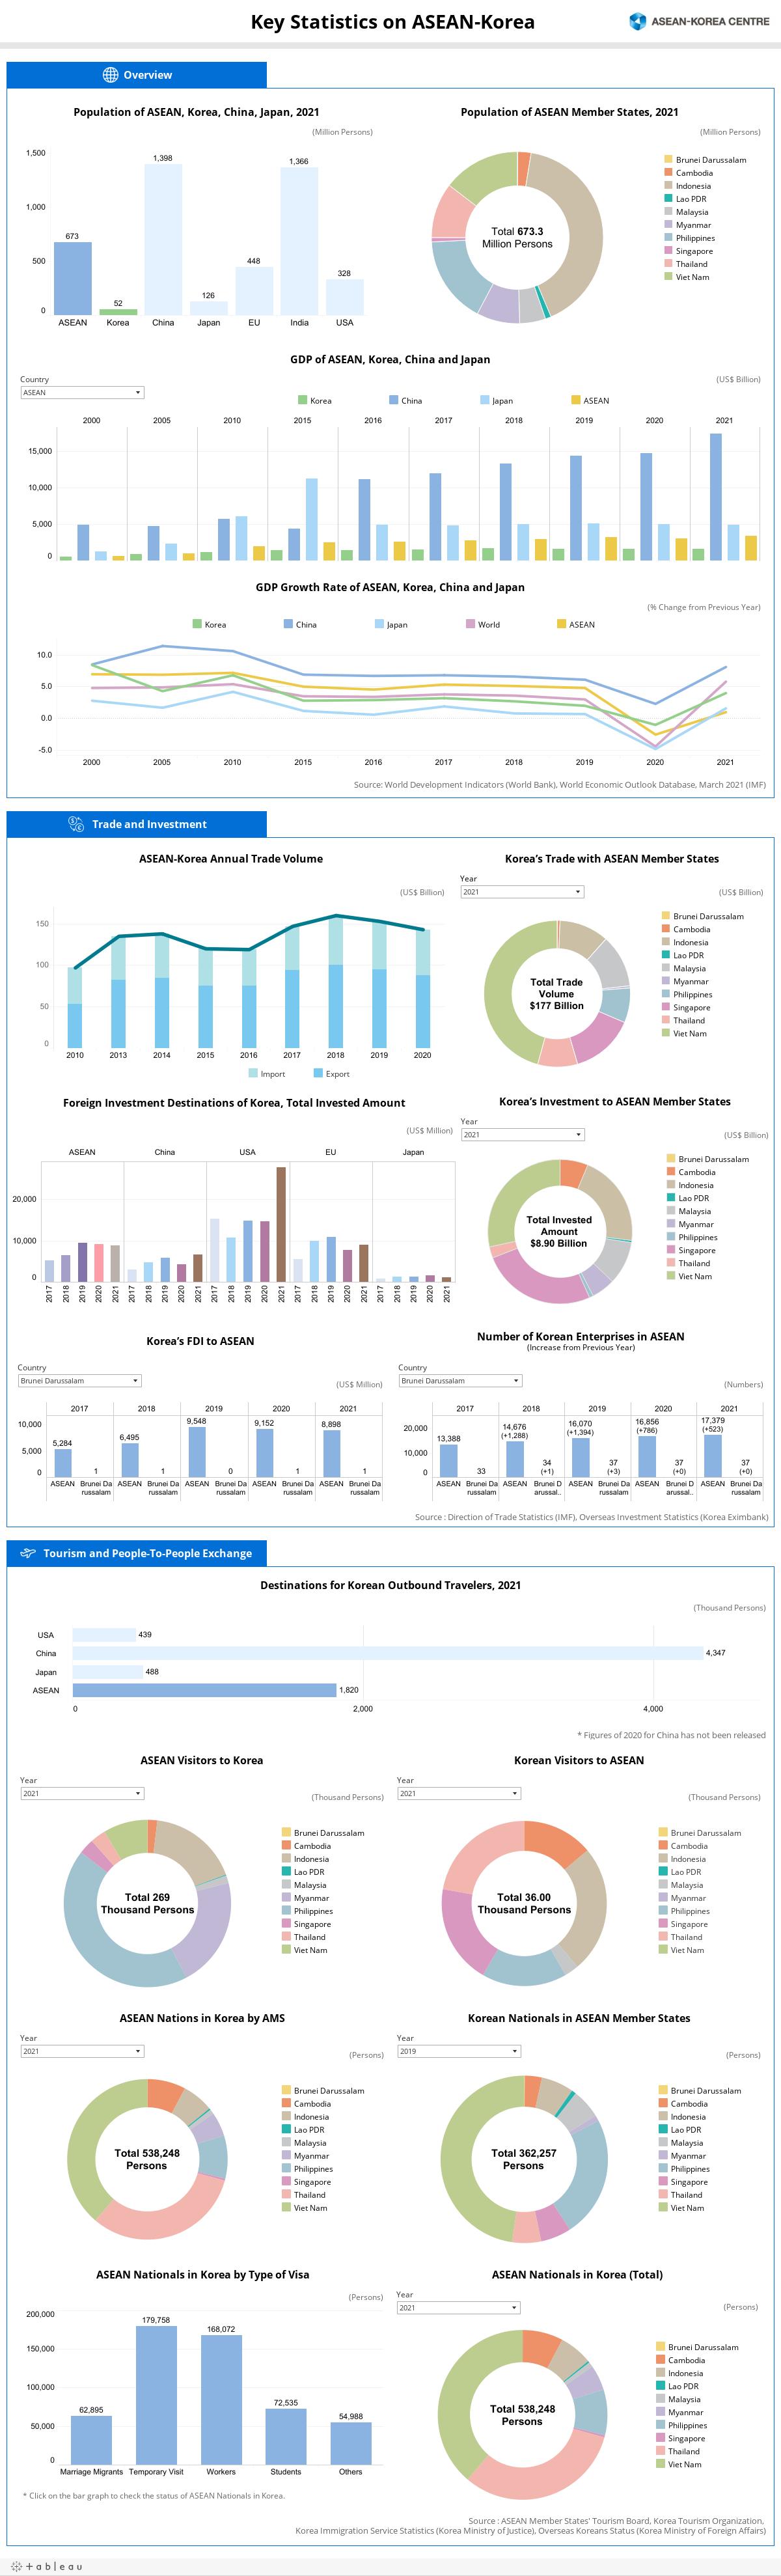 Key Statistics on ASEAN-Korea